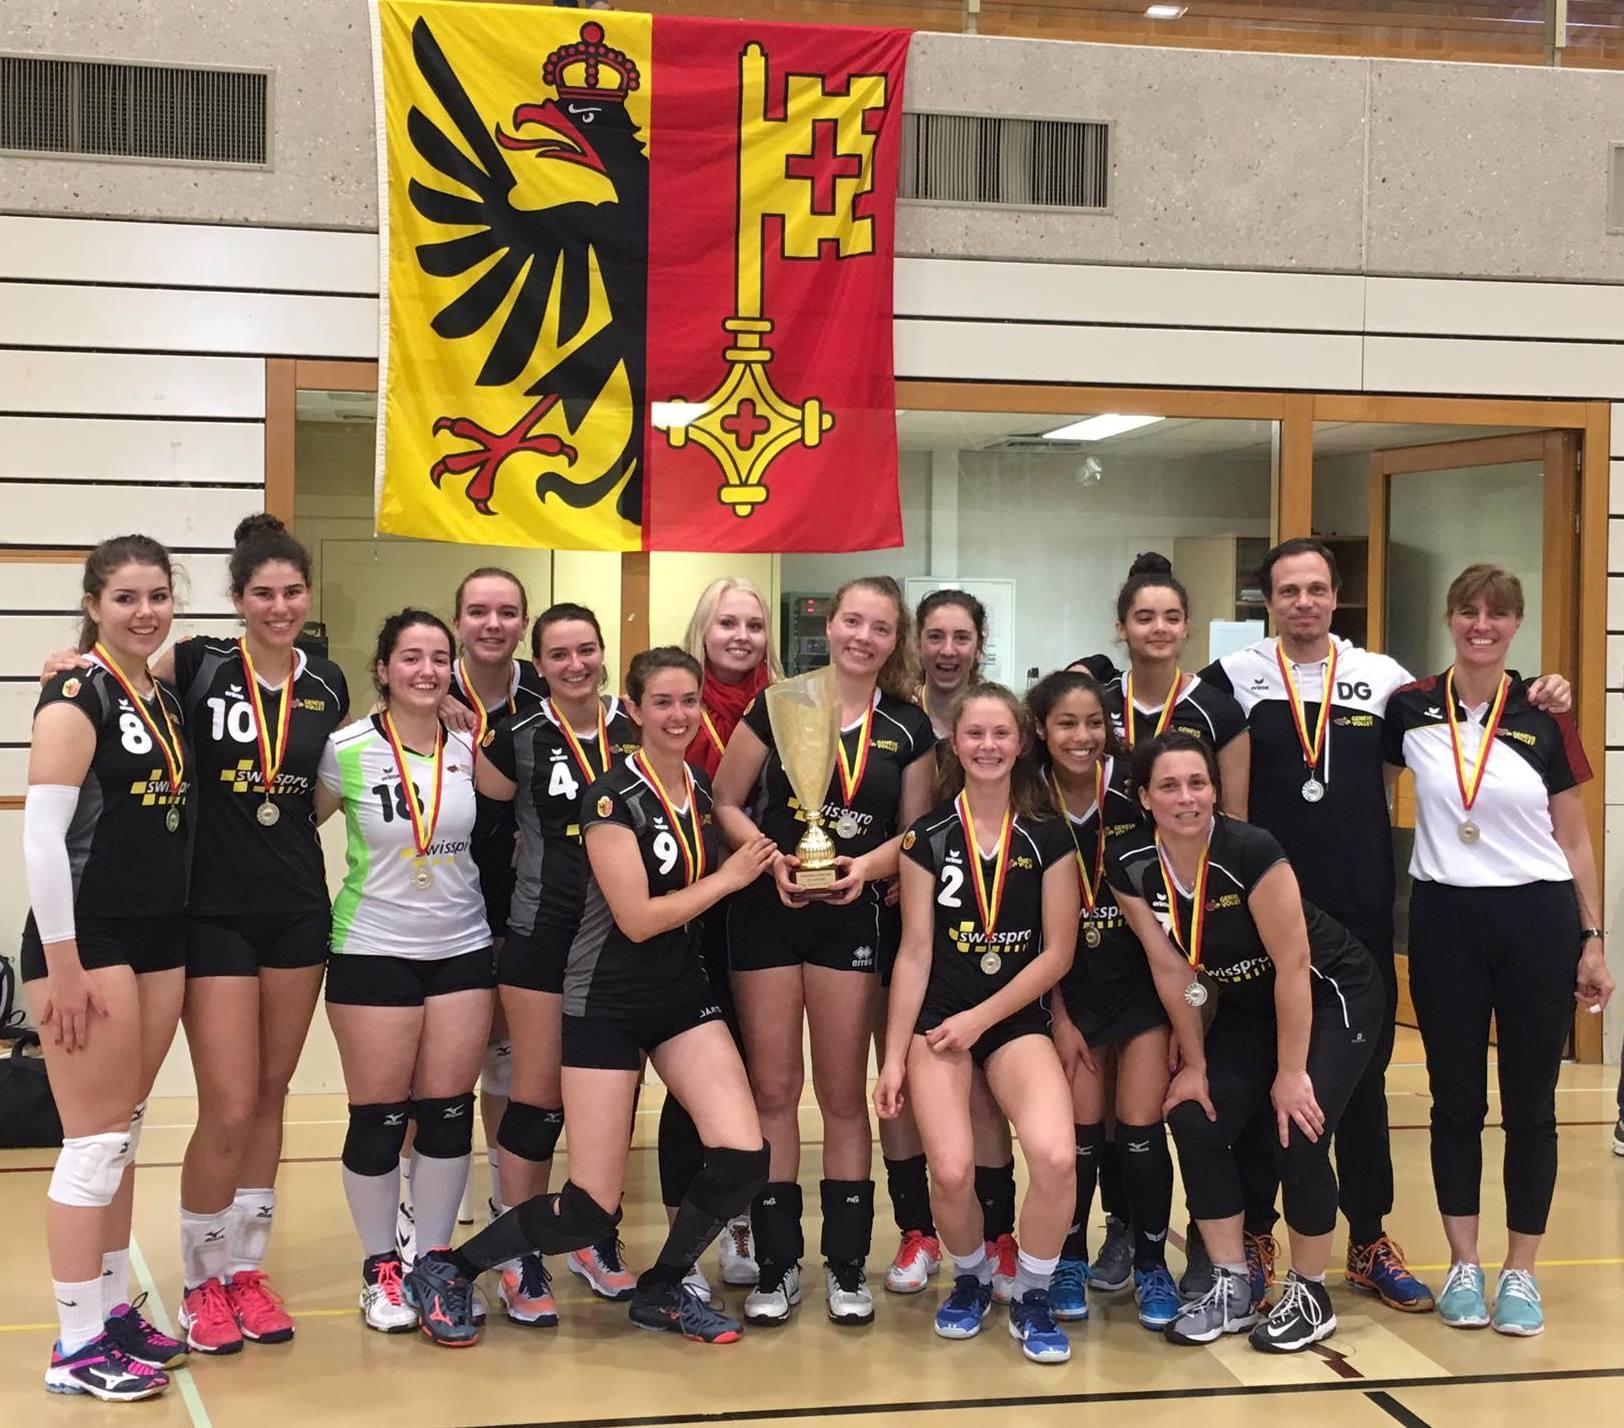 Genève Volley III remporte la Coupe Genevoise 2019 !